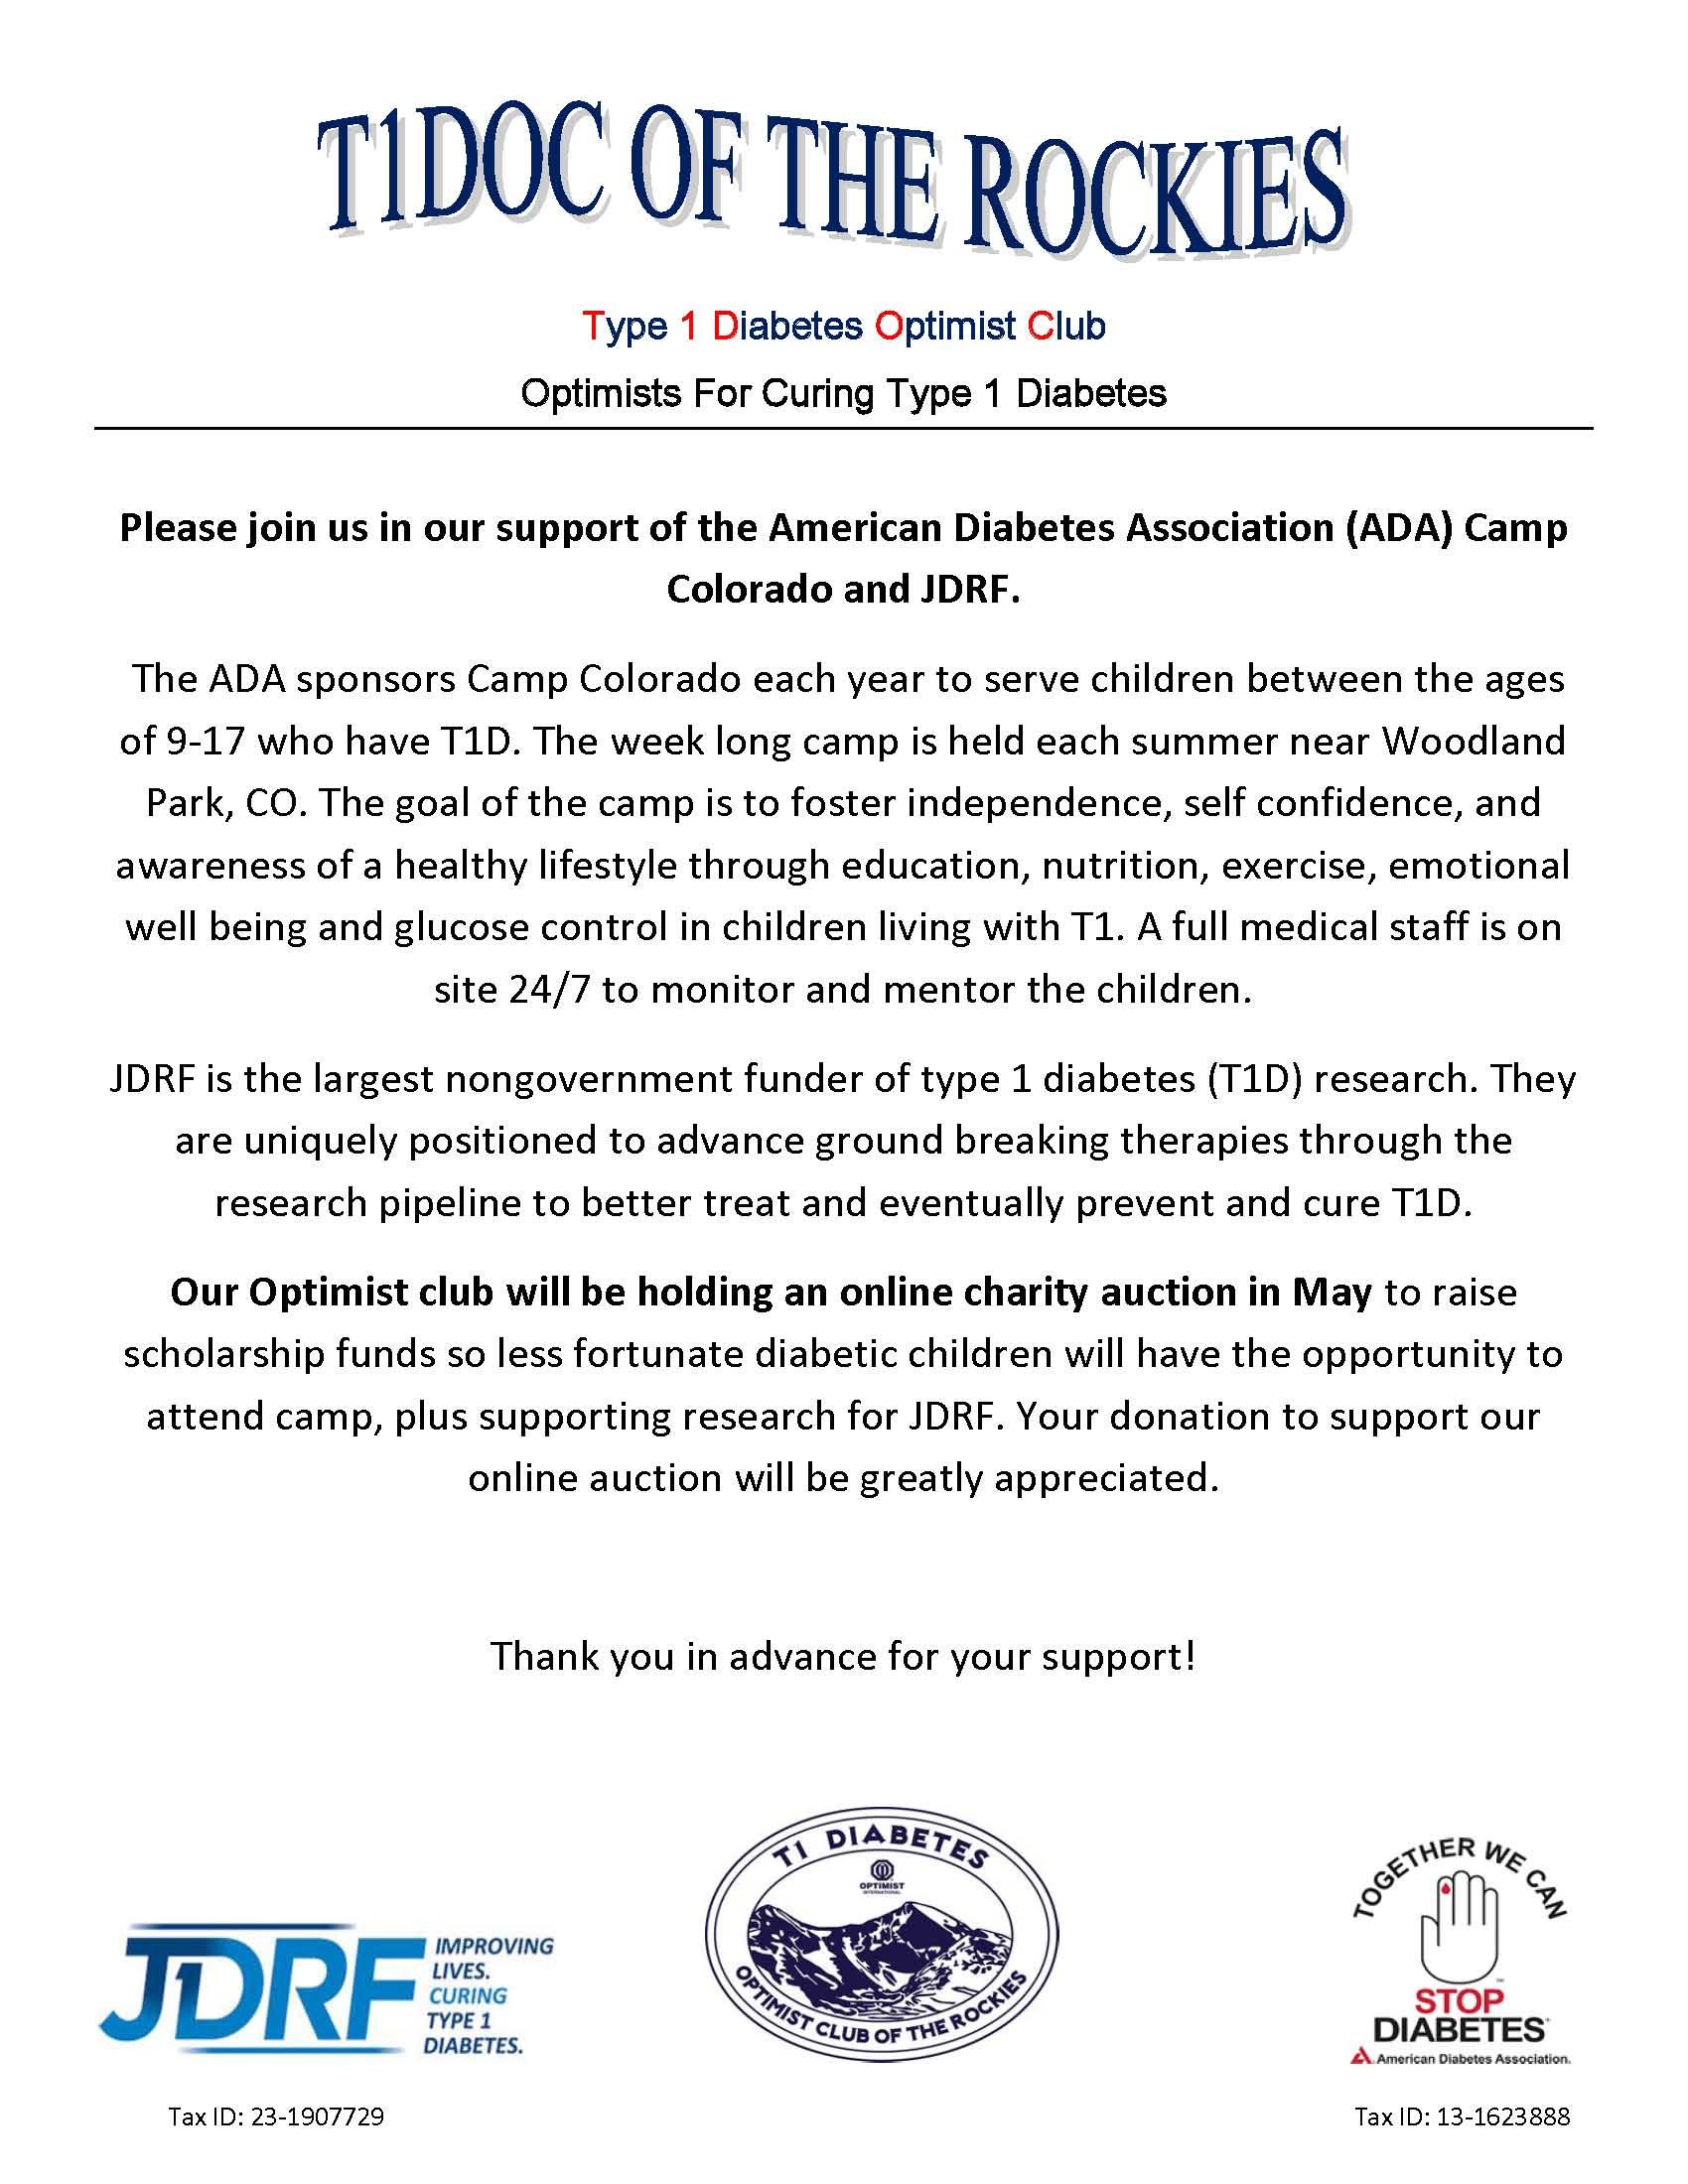 T1DOC Online Auction for Camp Colorado - T1 Diabetes Summer Camp